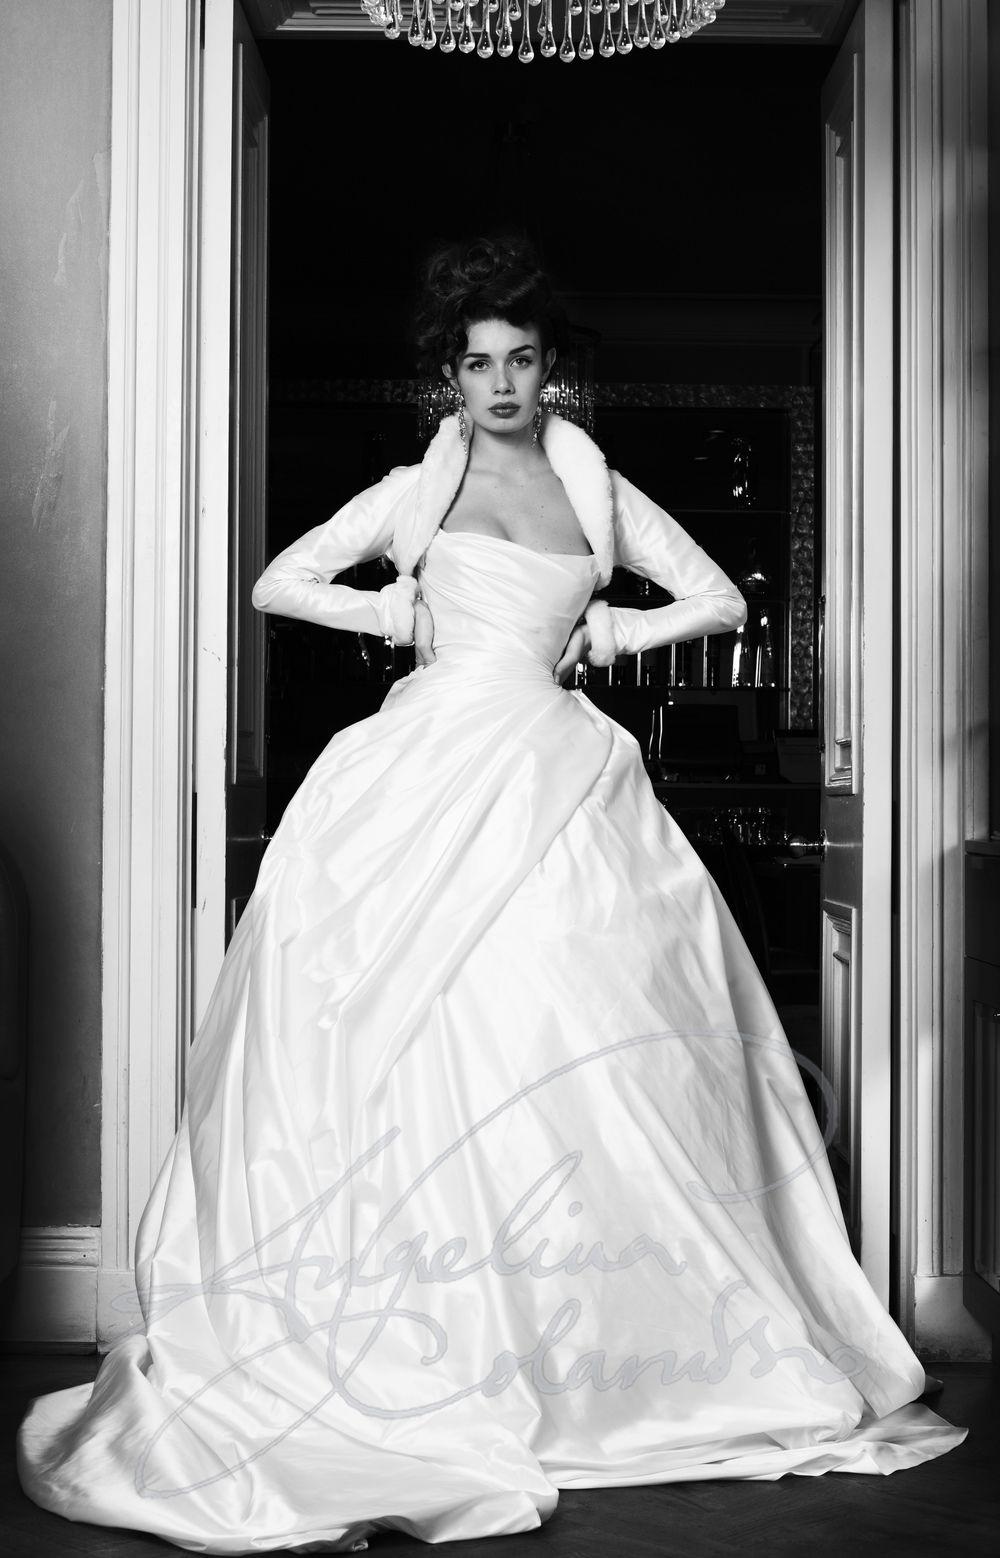 Epoque | My B&W Wedding | Pinterest | Wedding dress and Wedding